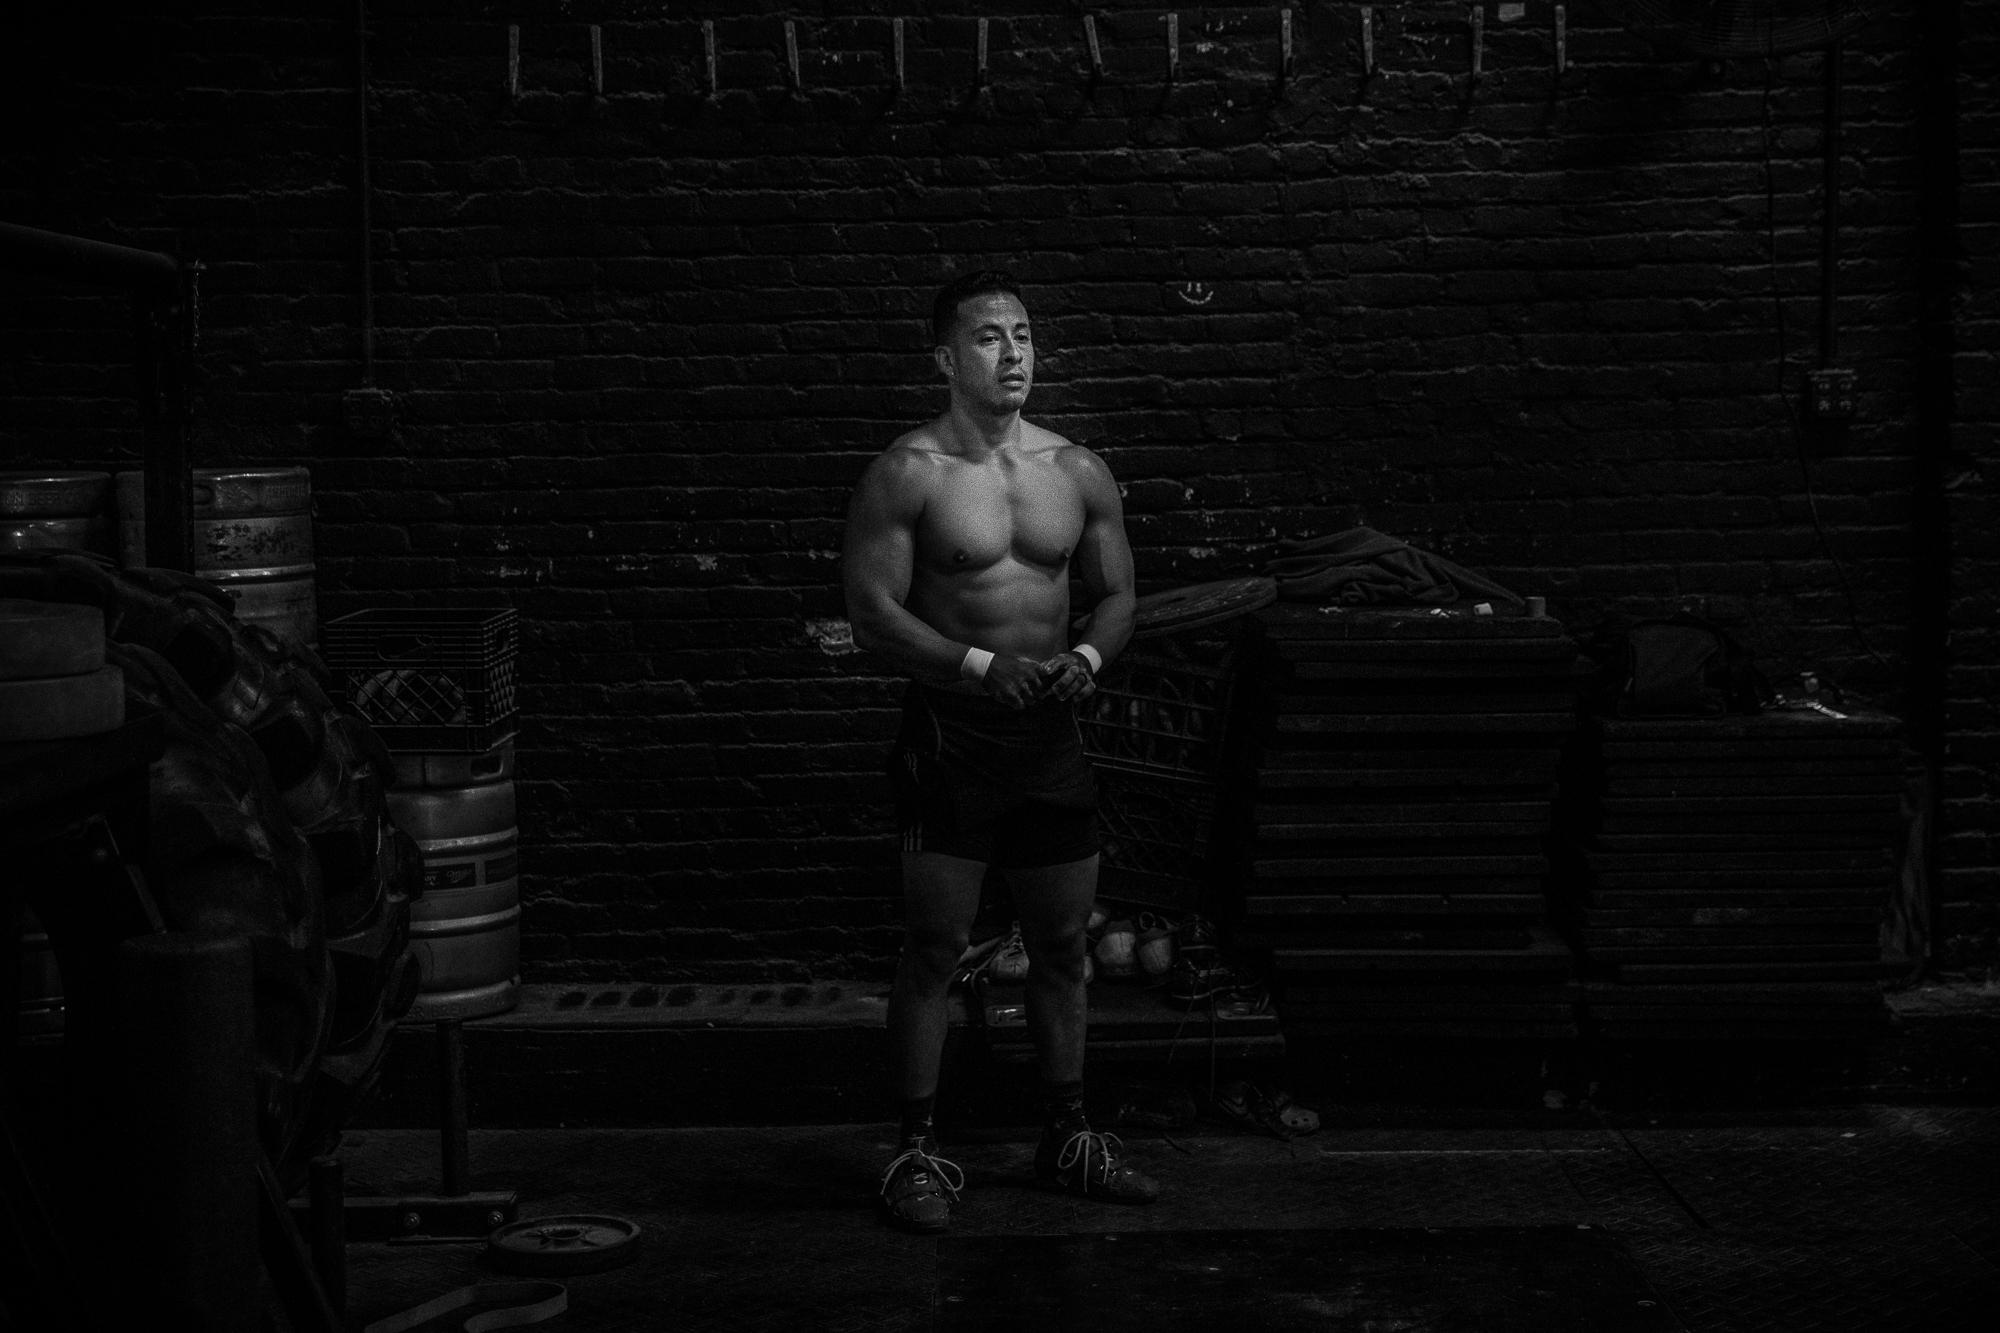 weightlifting-photos-by-viviana-podhaiski-sports-photographer.jpg